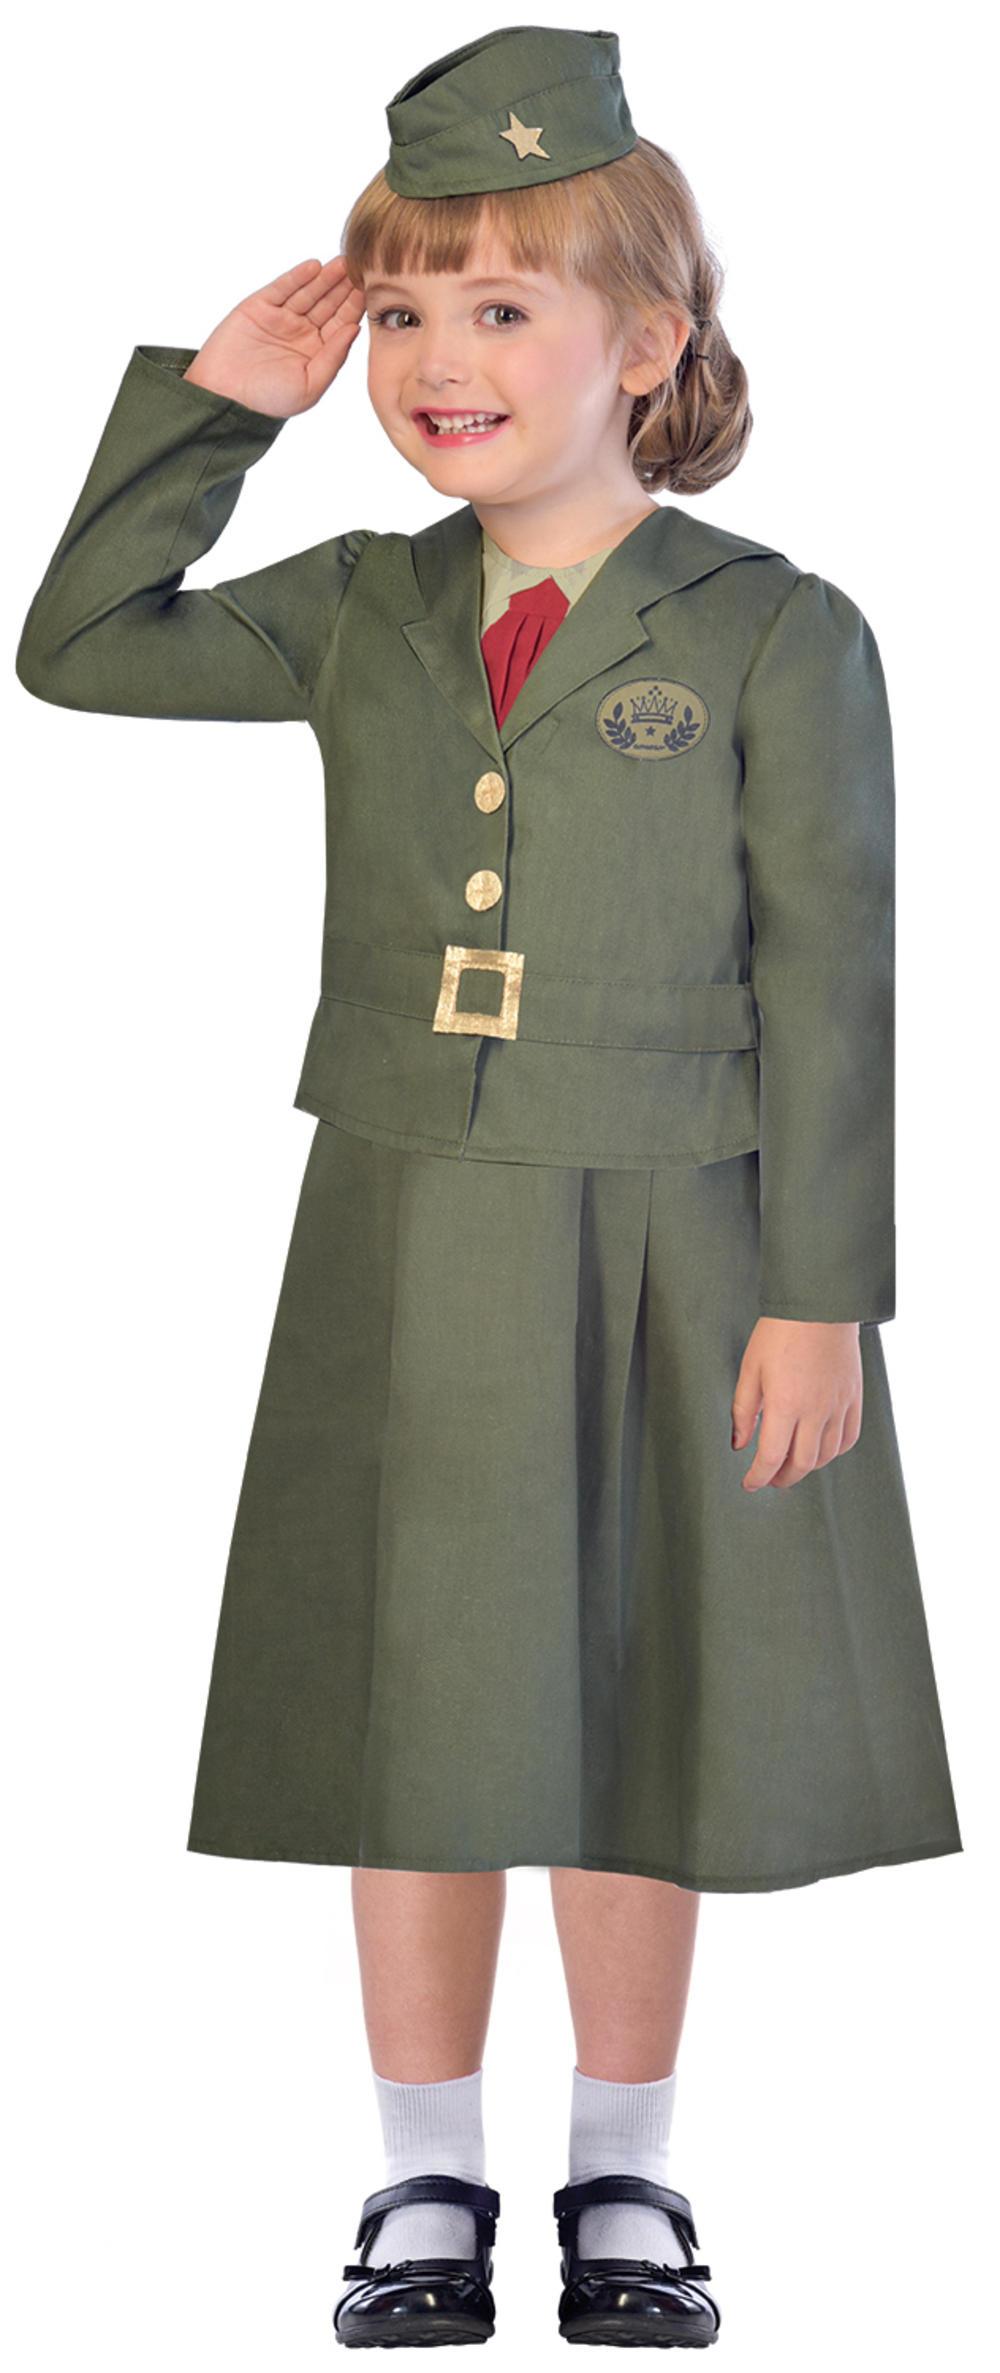 WW2 Soldier Girls Fancy Dress Army Uniform 40s World Book Day Childs Kid Costume